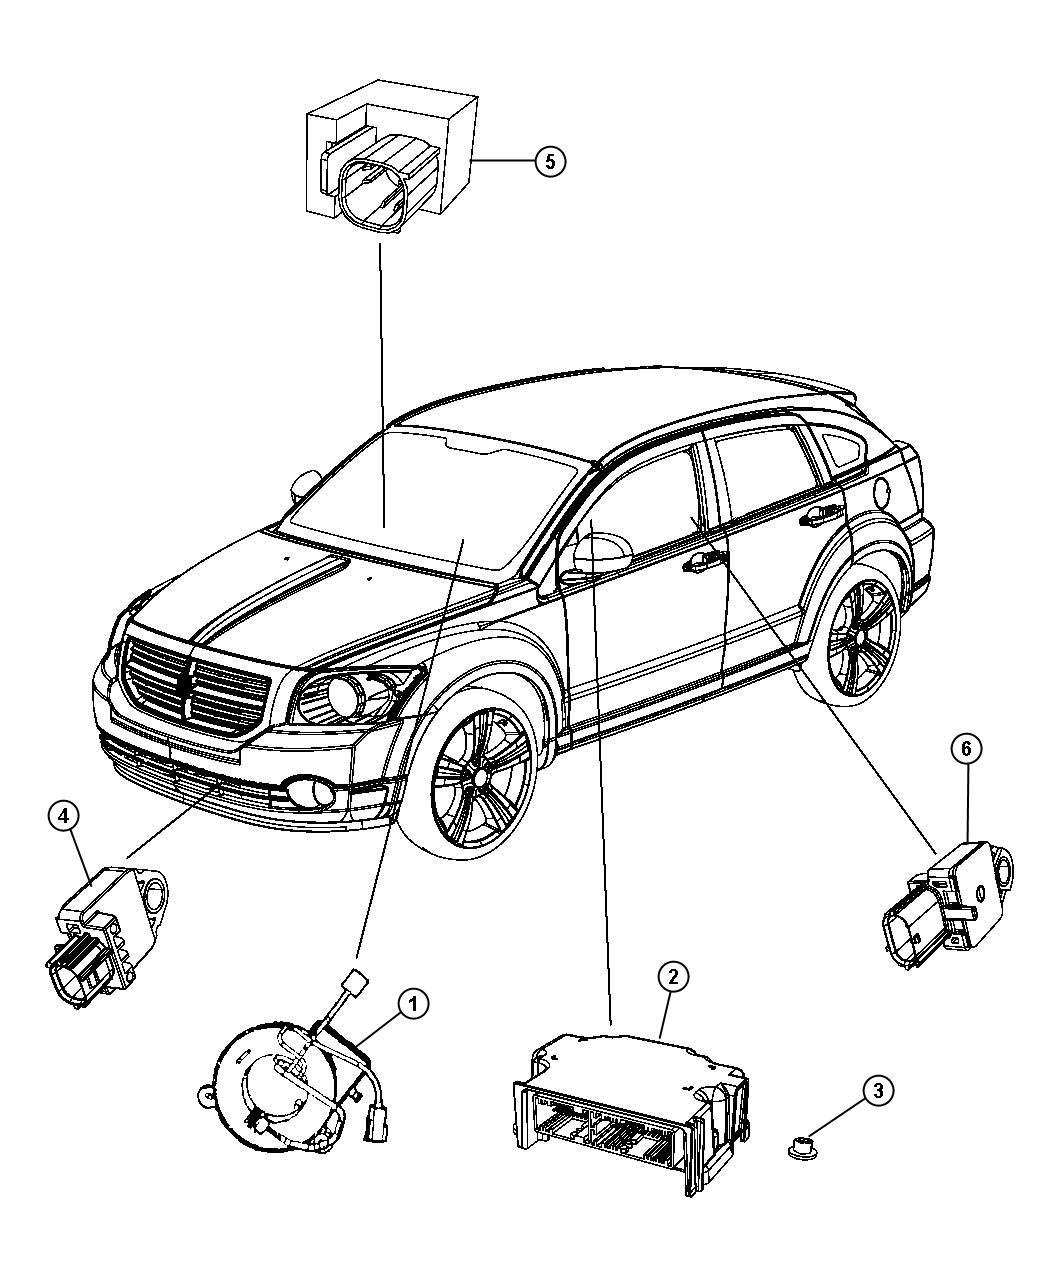 2010 Dodge Caliber Module. Occupant restraint. [cg1, cj4